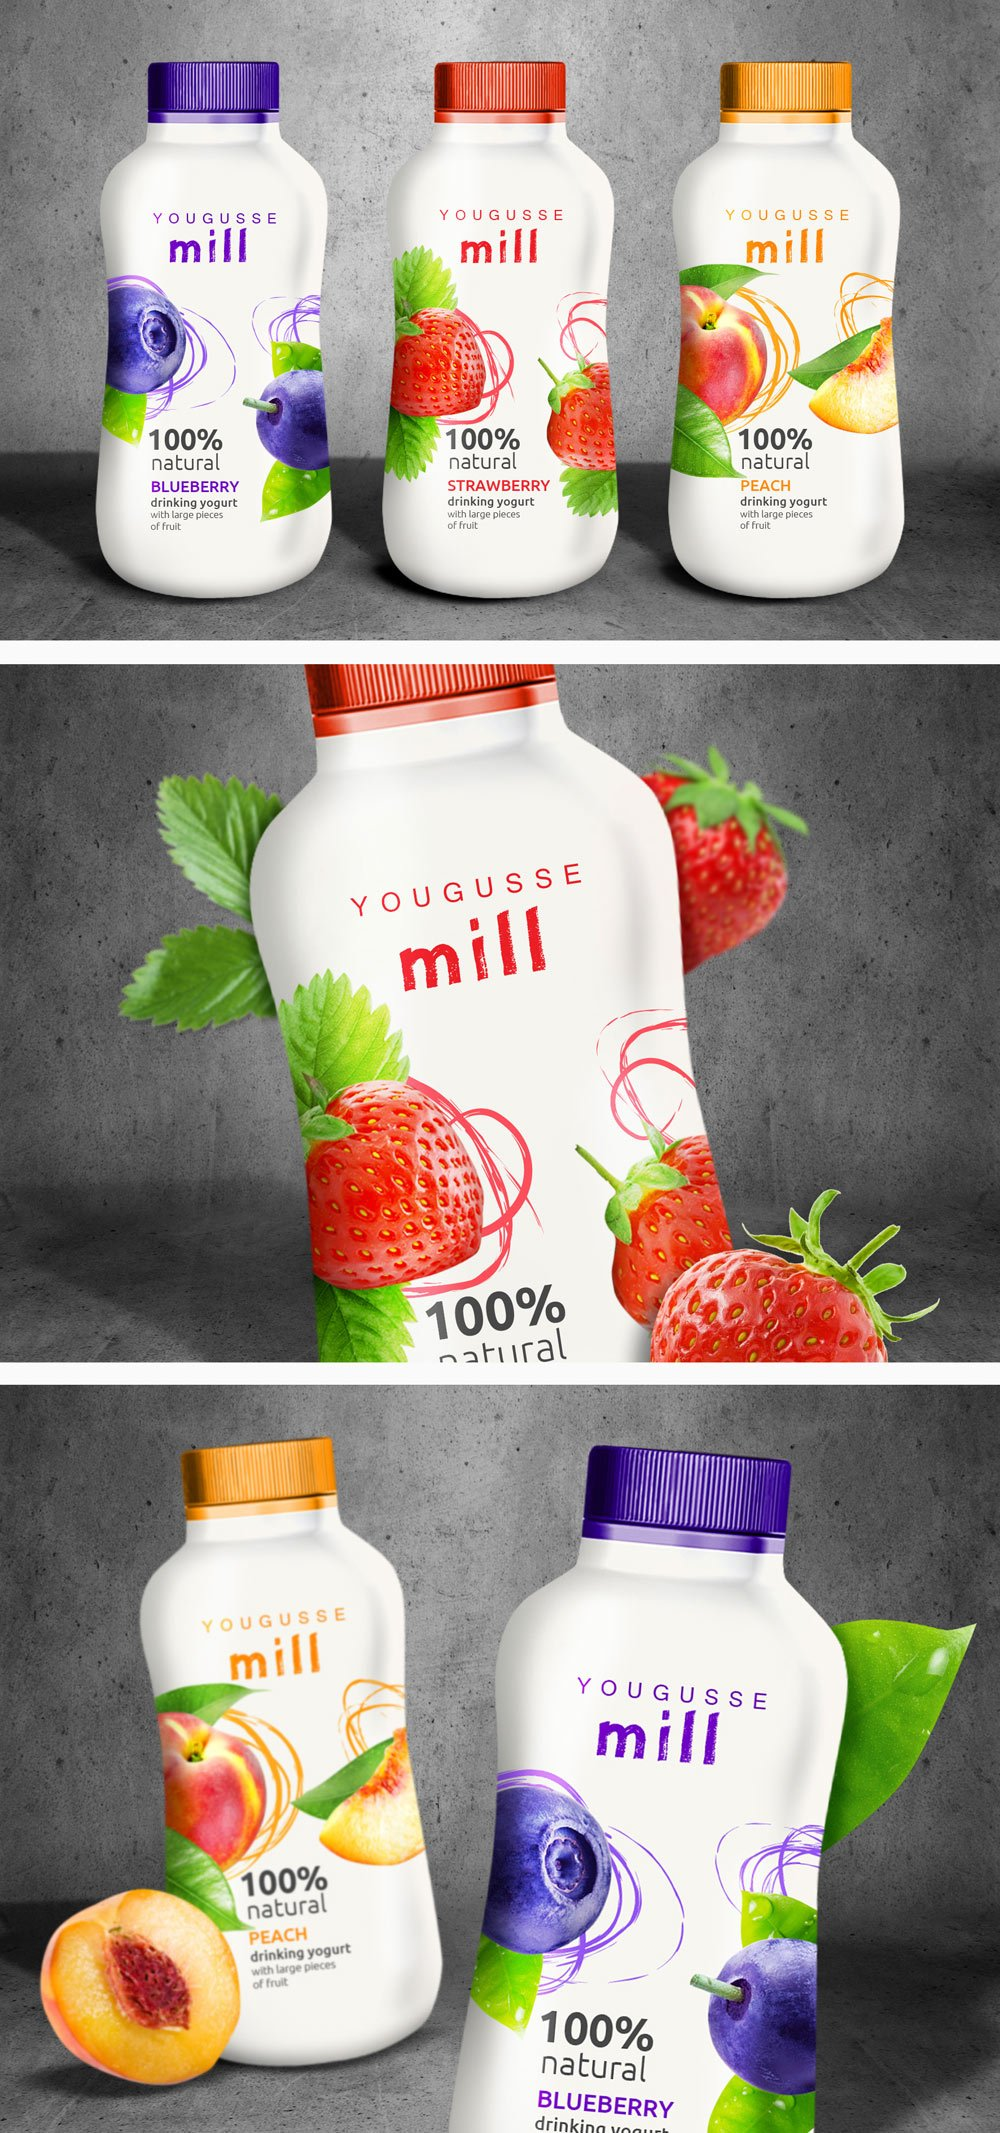 Packaging Jogurt Yougusse